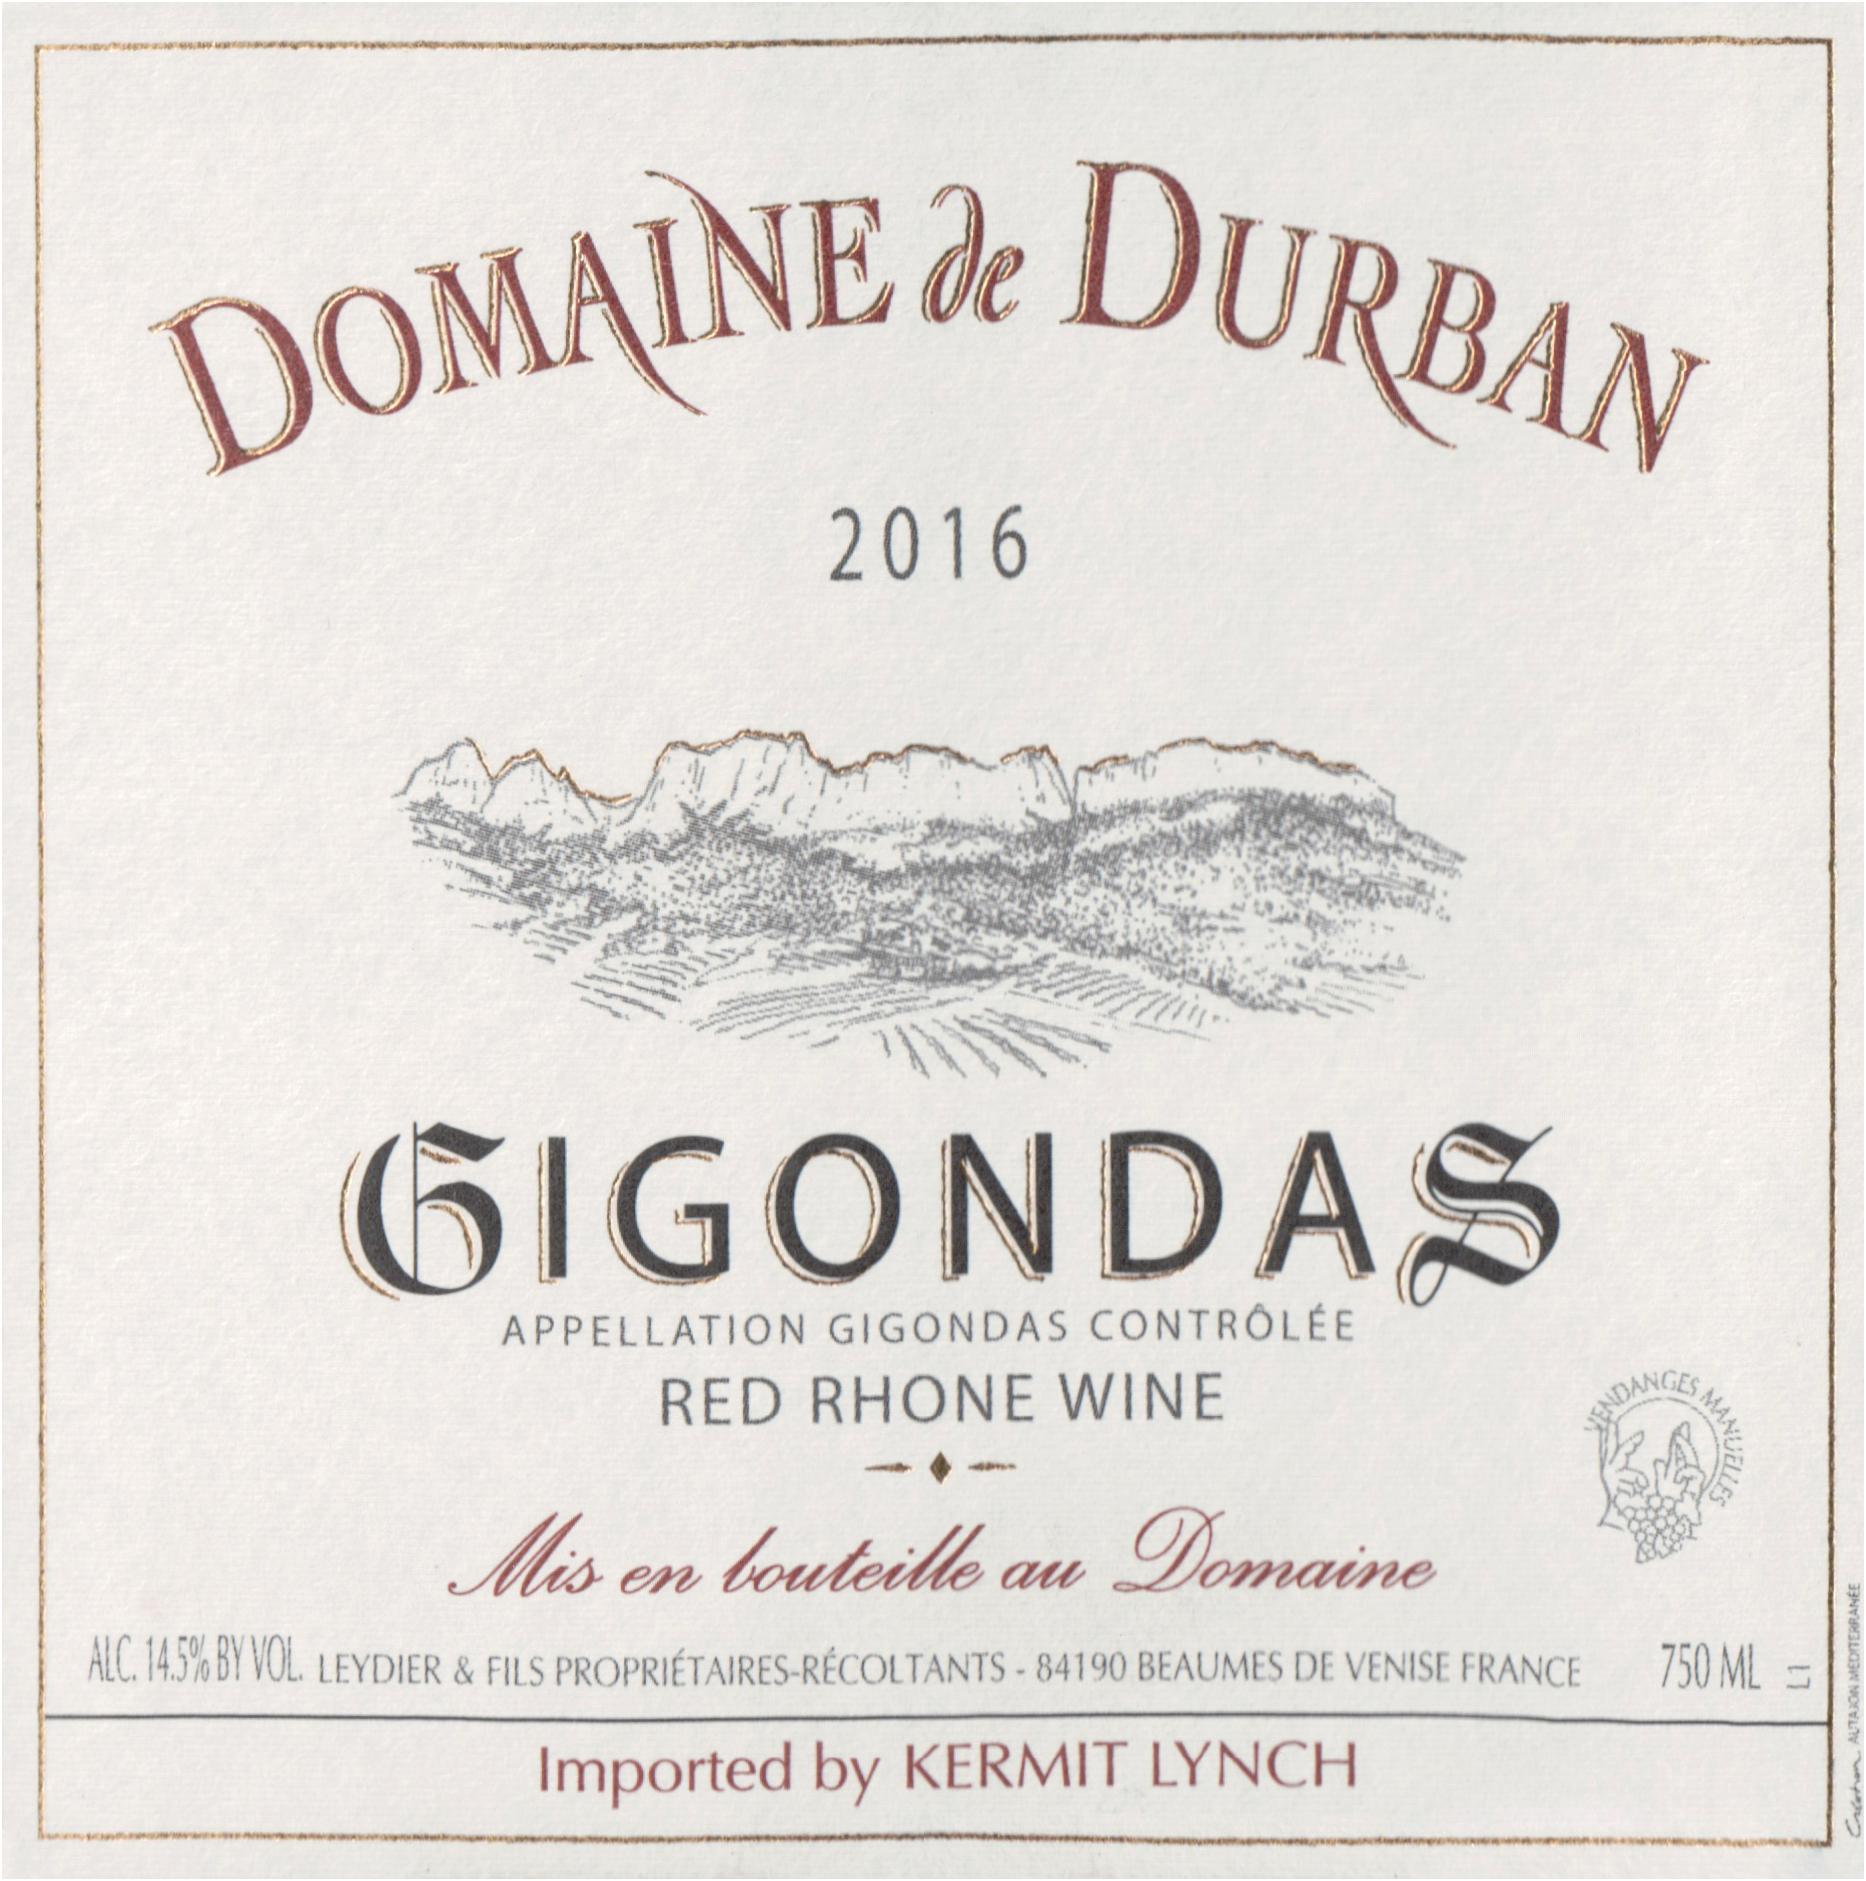 Domaine De Durban Gigondas 2016